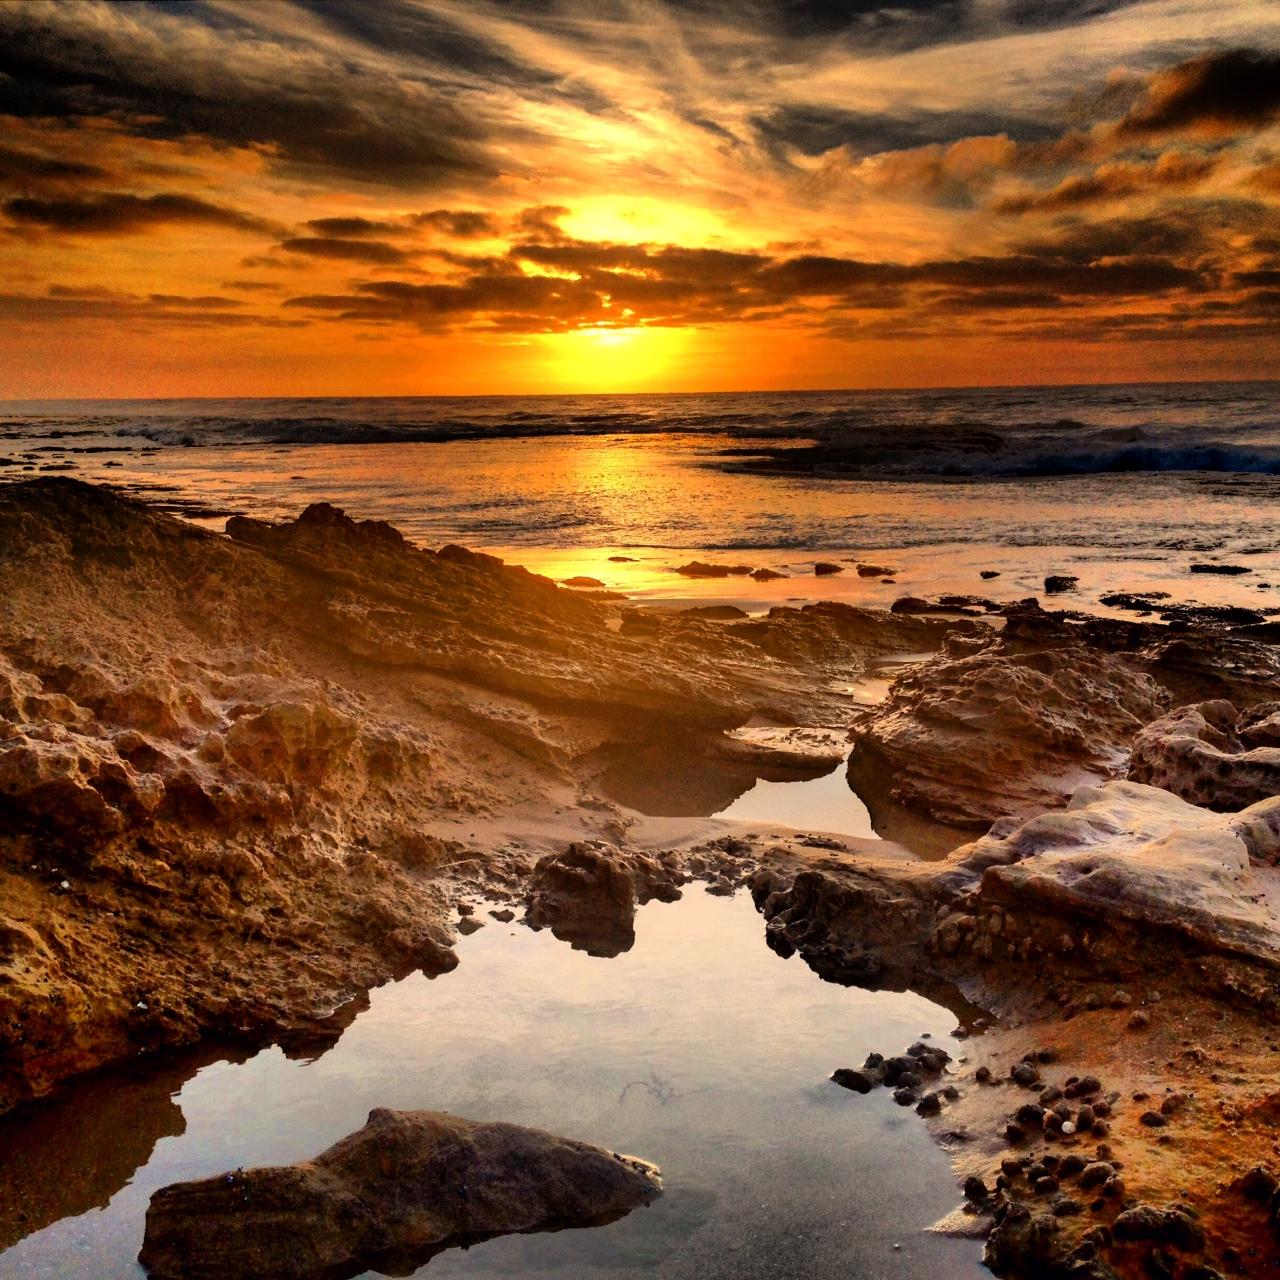 Sunrise at Anglesea by Alan Fletcher